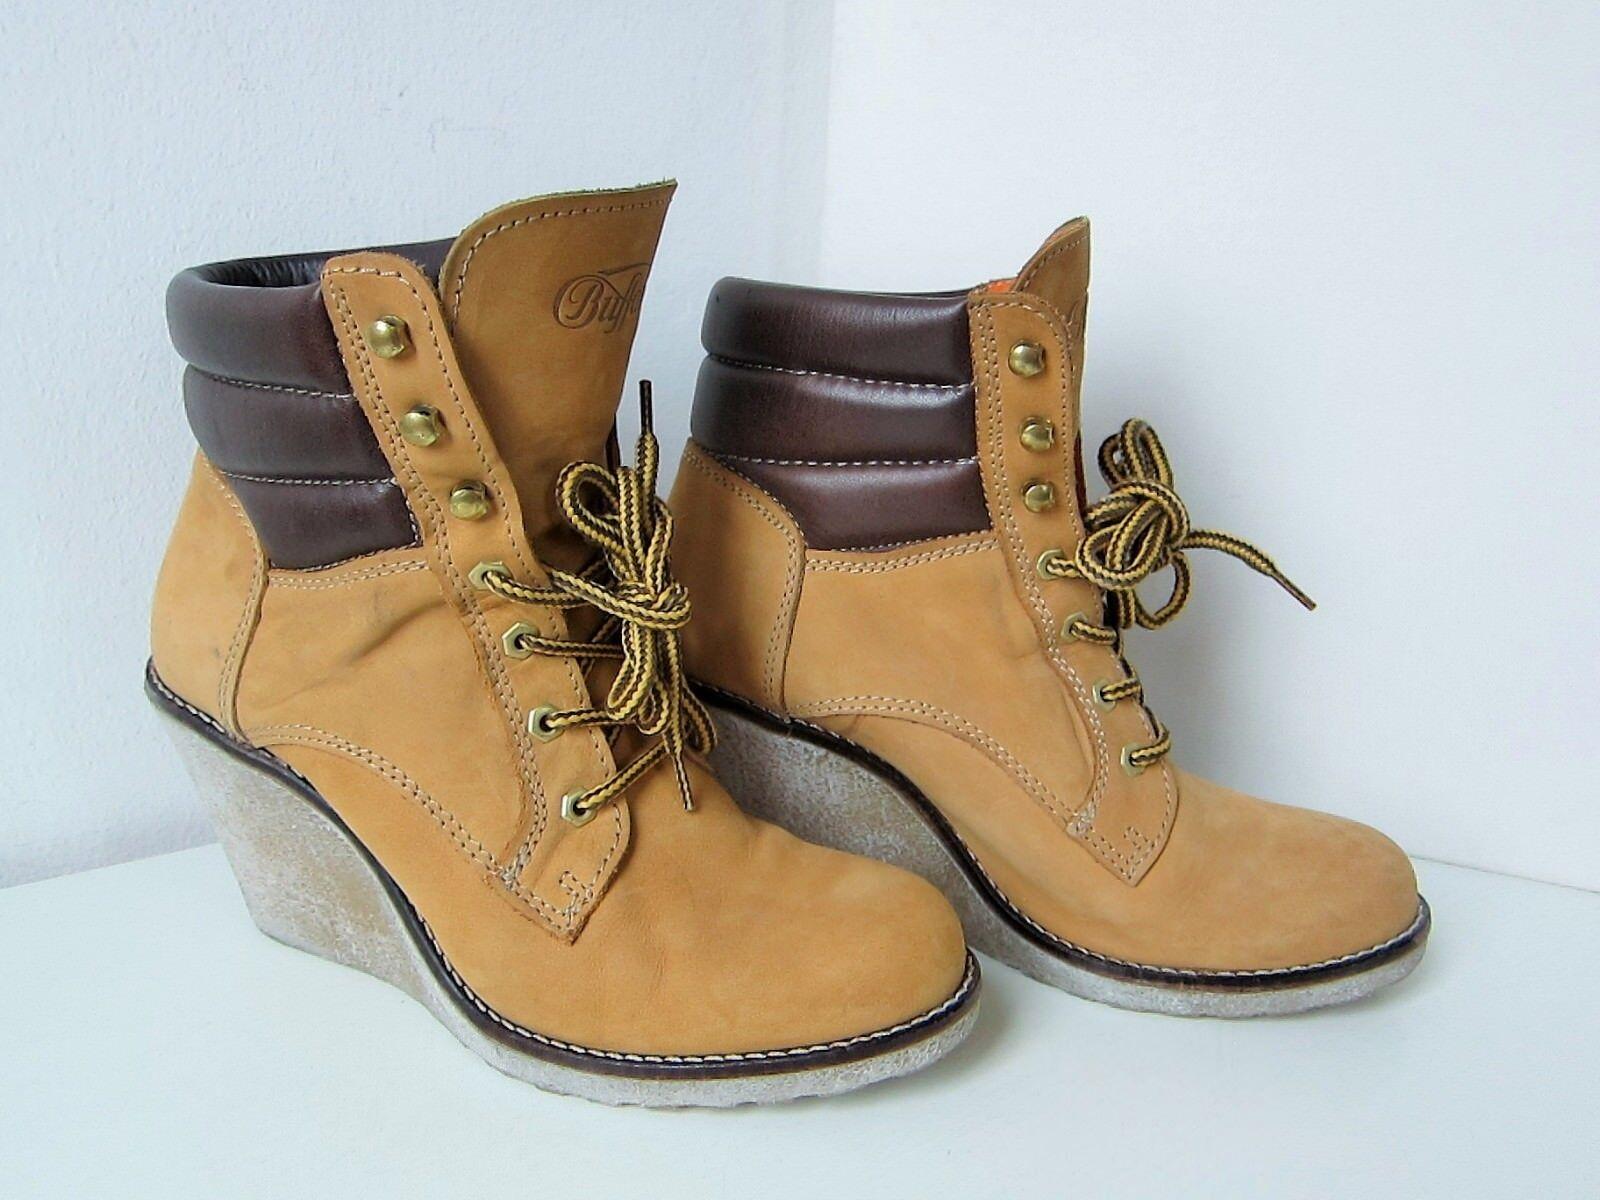 Buffalo Keilabsatz Stiefelette Bootie camel Gr. 40 hellbrown Wedge Boots Stiefel